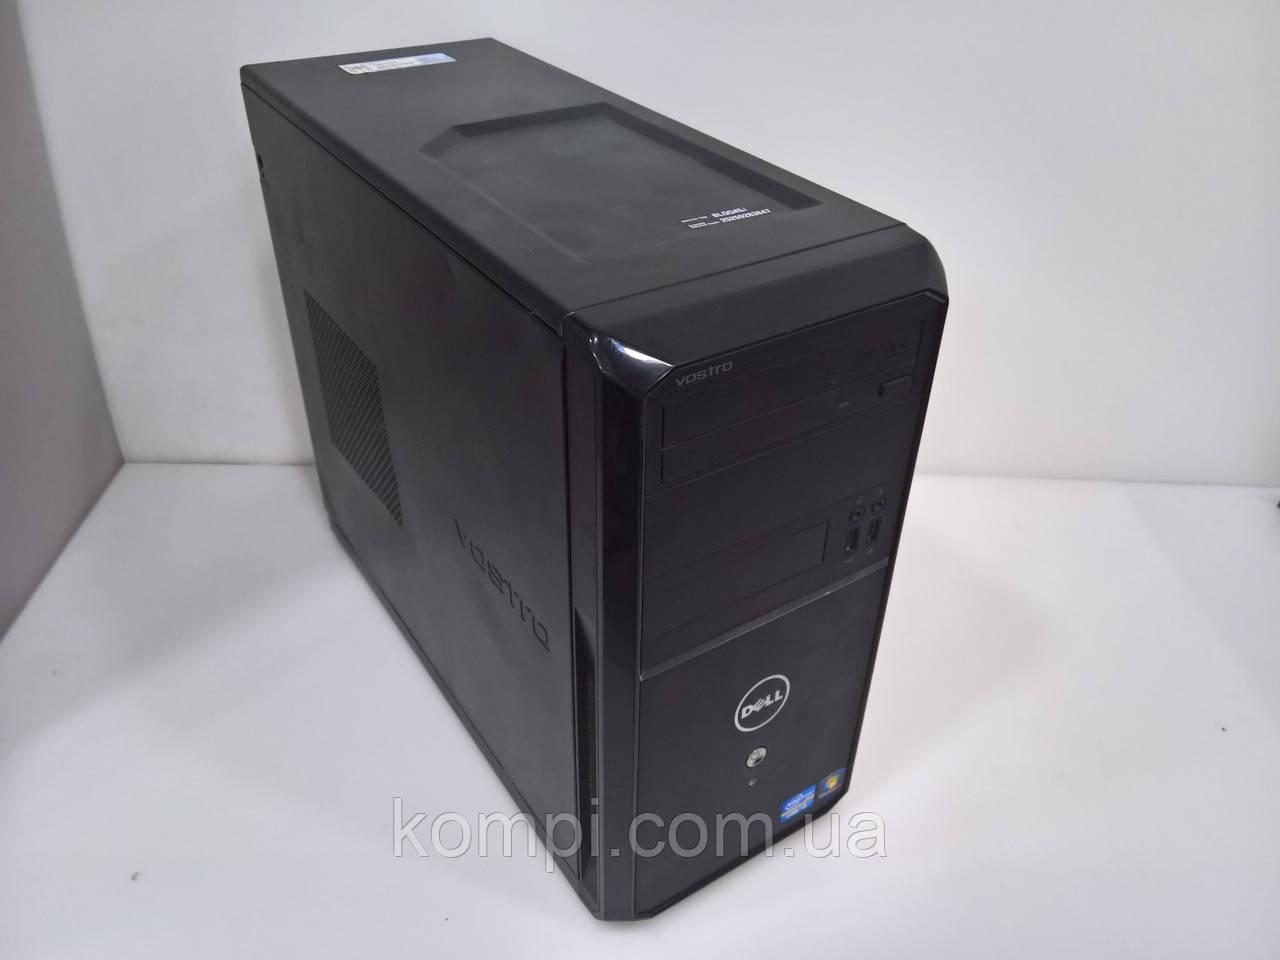 Системний блок Intel I3 DELL VOSTRO (INTEL CORE I3 2100/2Gb DDR3/Video INTG Intel HD/HDD 250Gb /DVD RW)